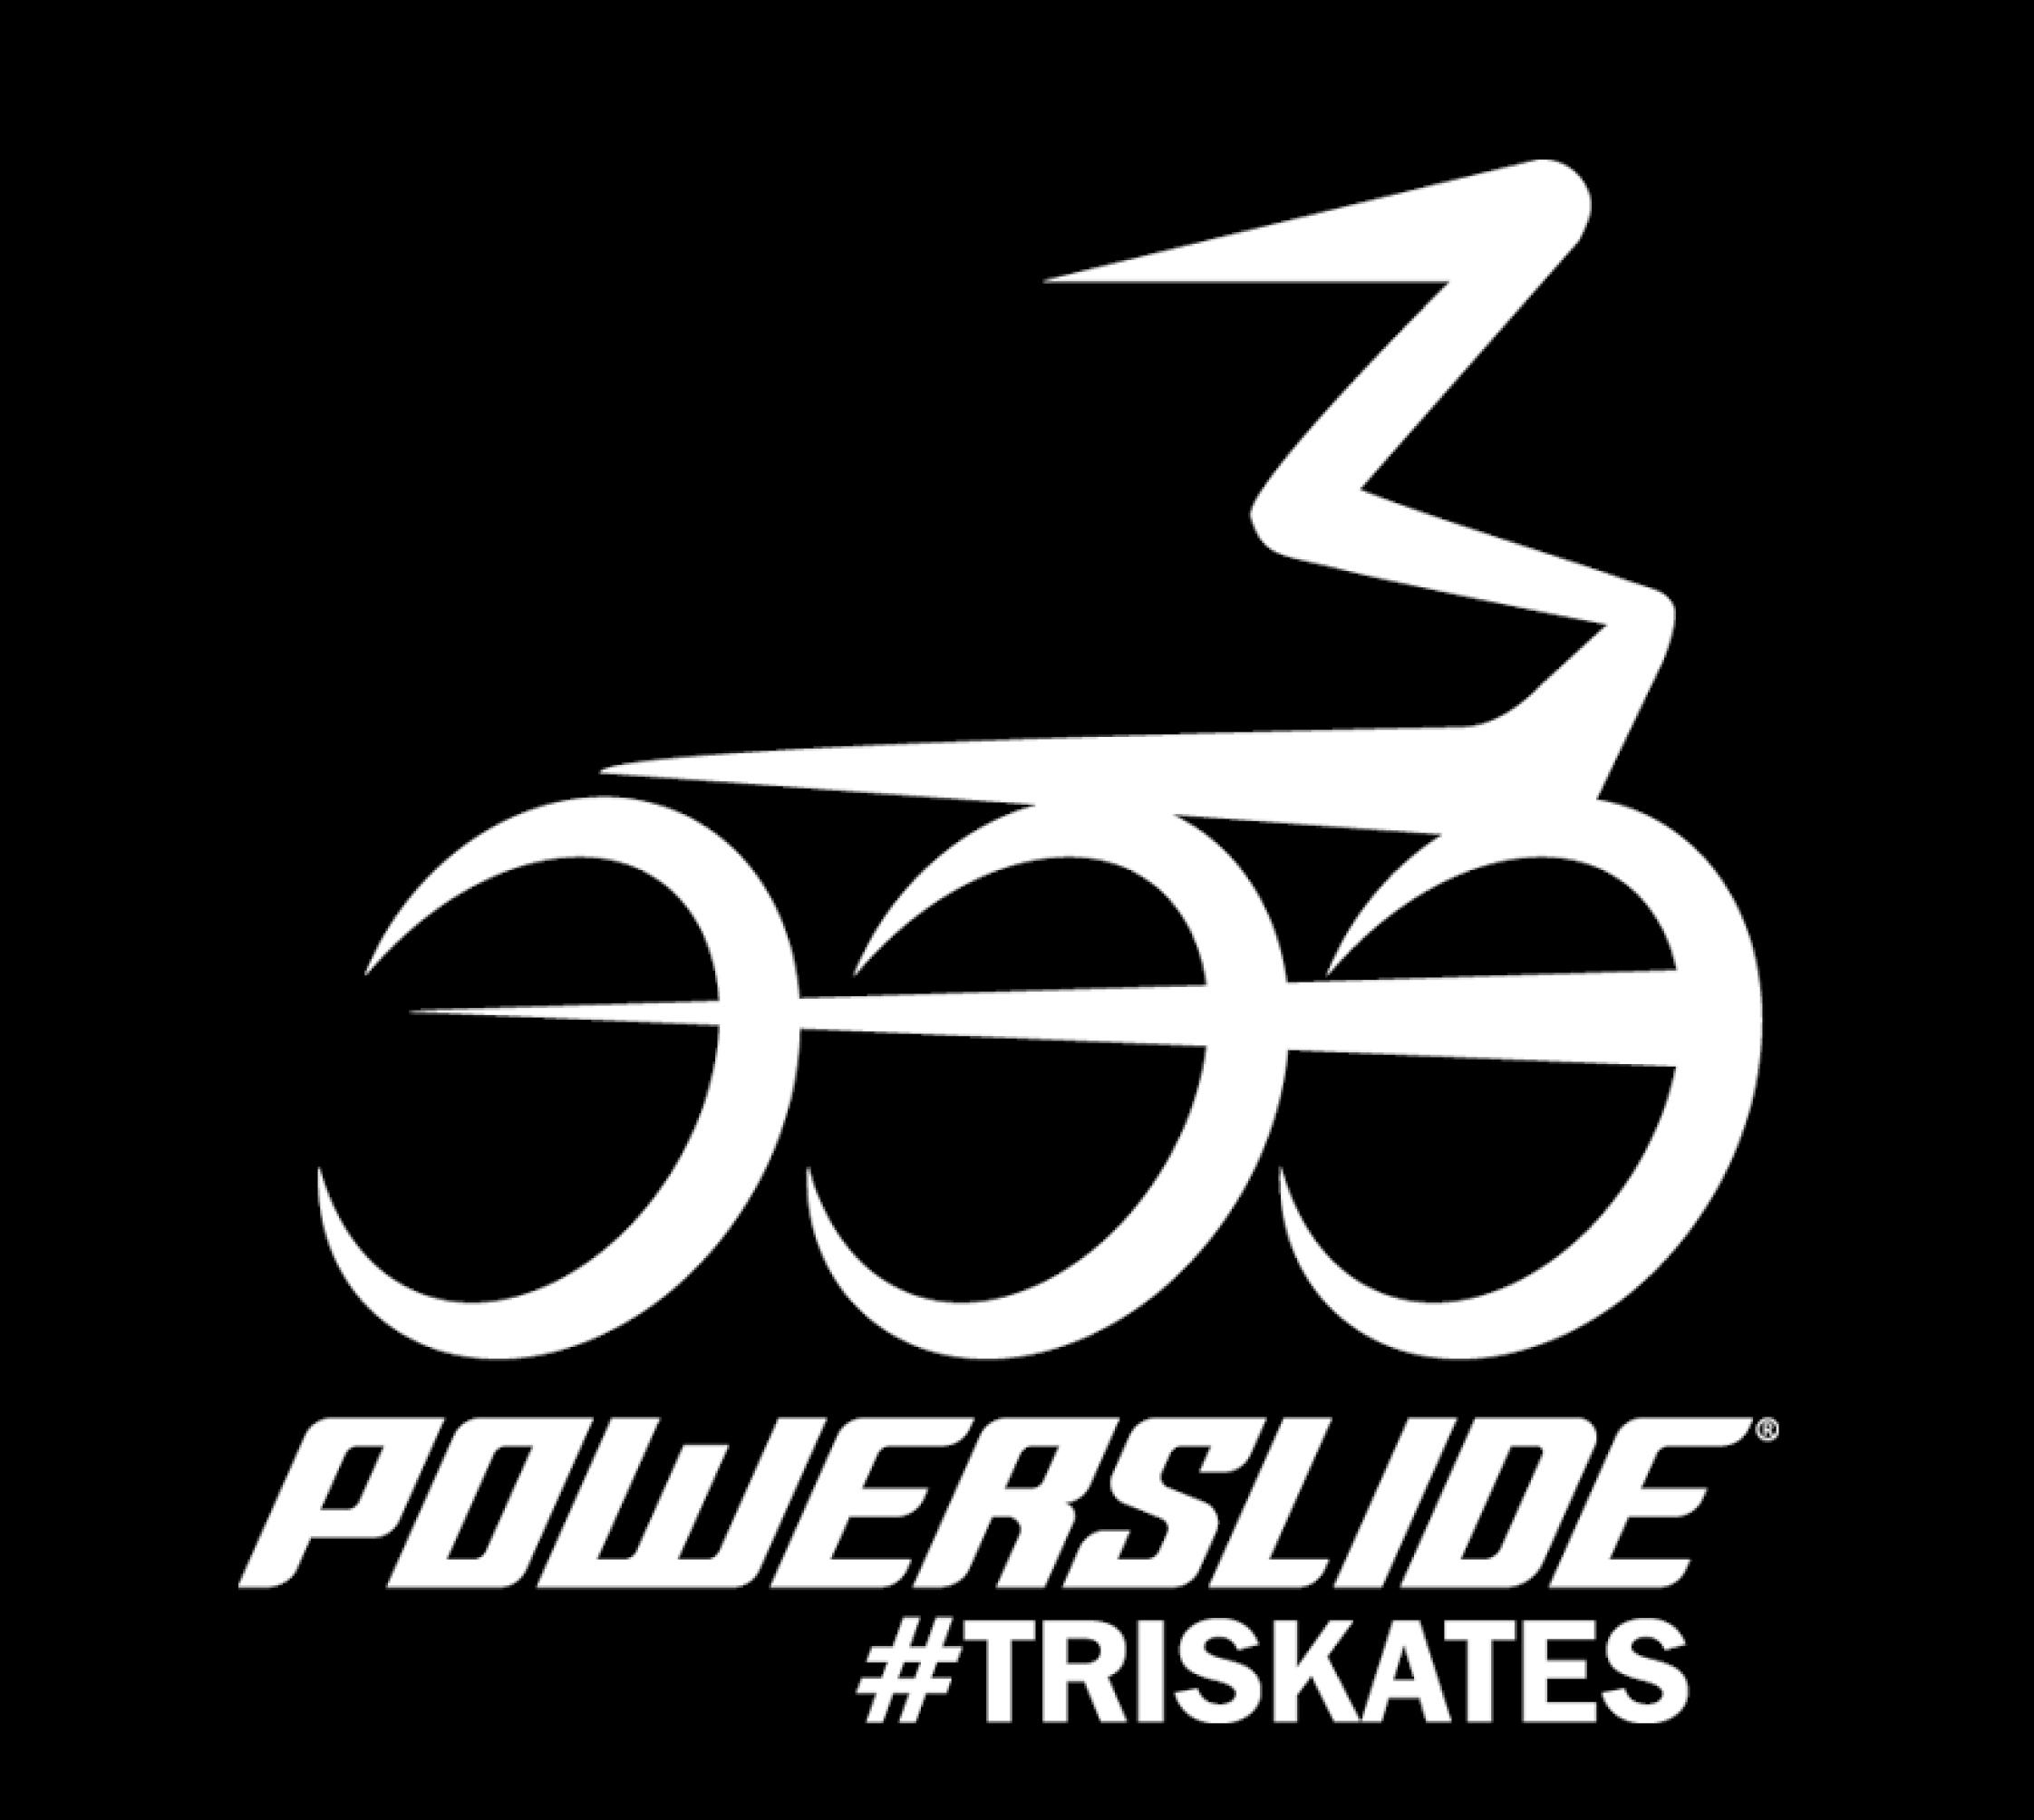 Triskates logo